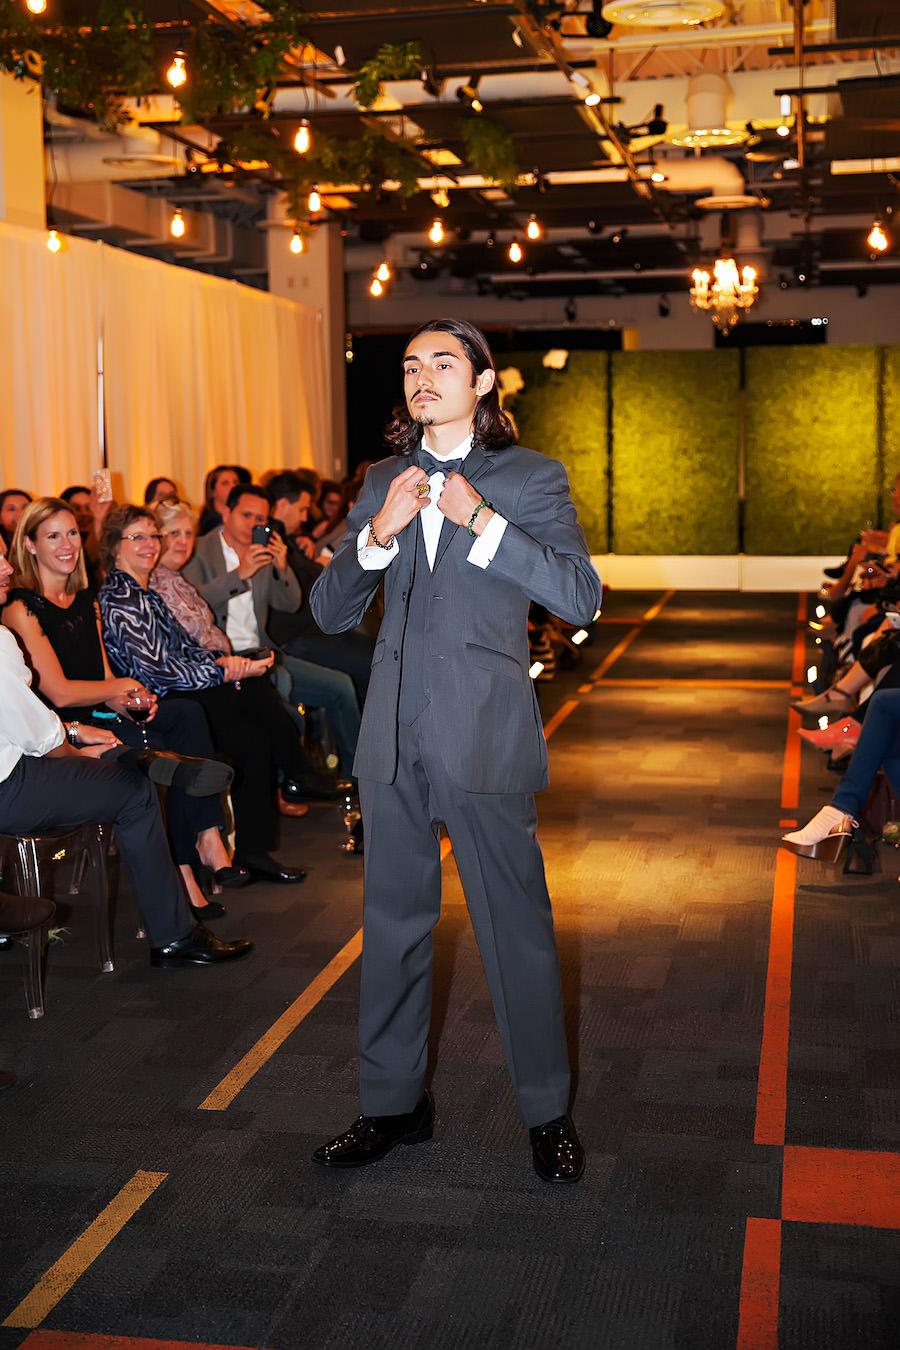 Marry Me Tampa Bay Wedding Week Bridal Fashion Runway Show | Grey Groomsmen Tuxedo Suit | Tampa Bay Wedding Photographer Limelight Photography | Wedding Planner Glitz Events